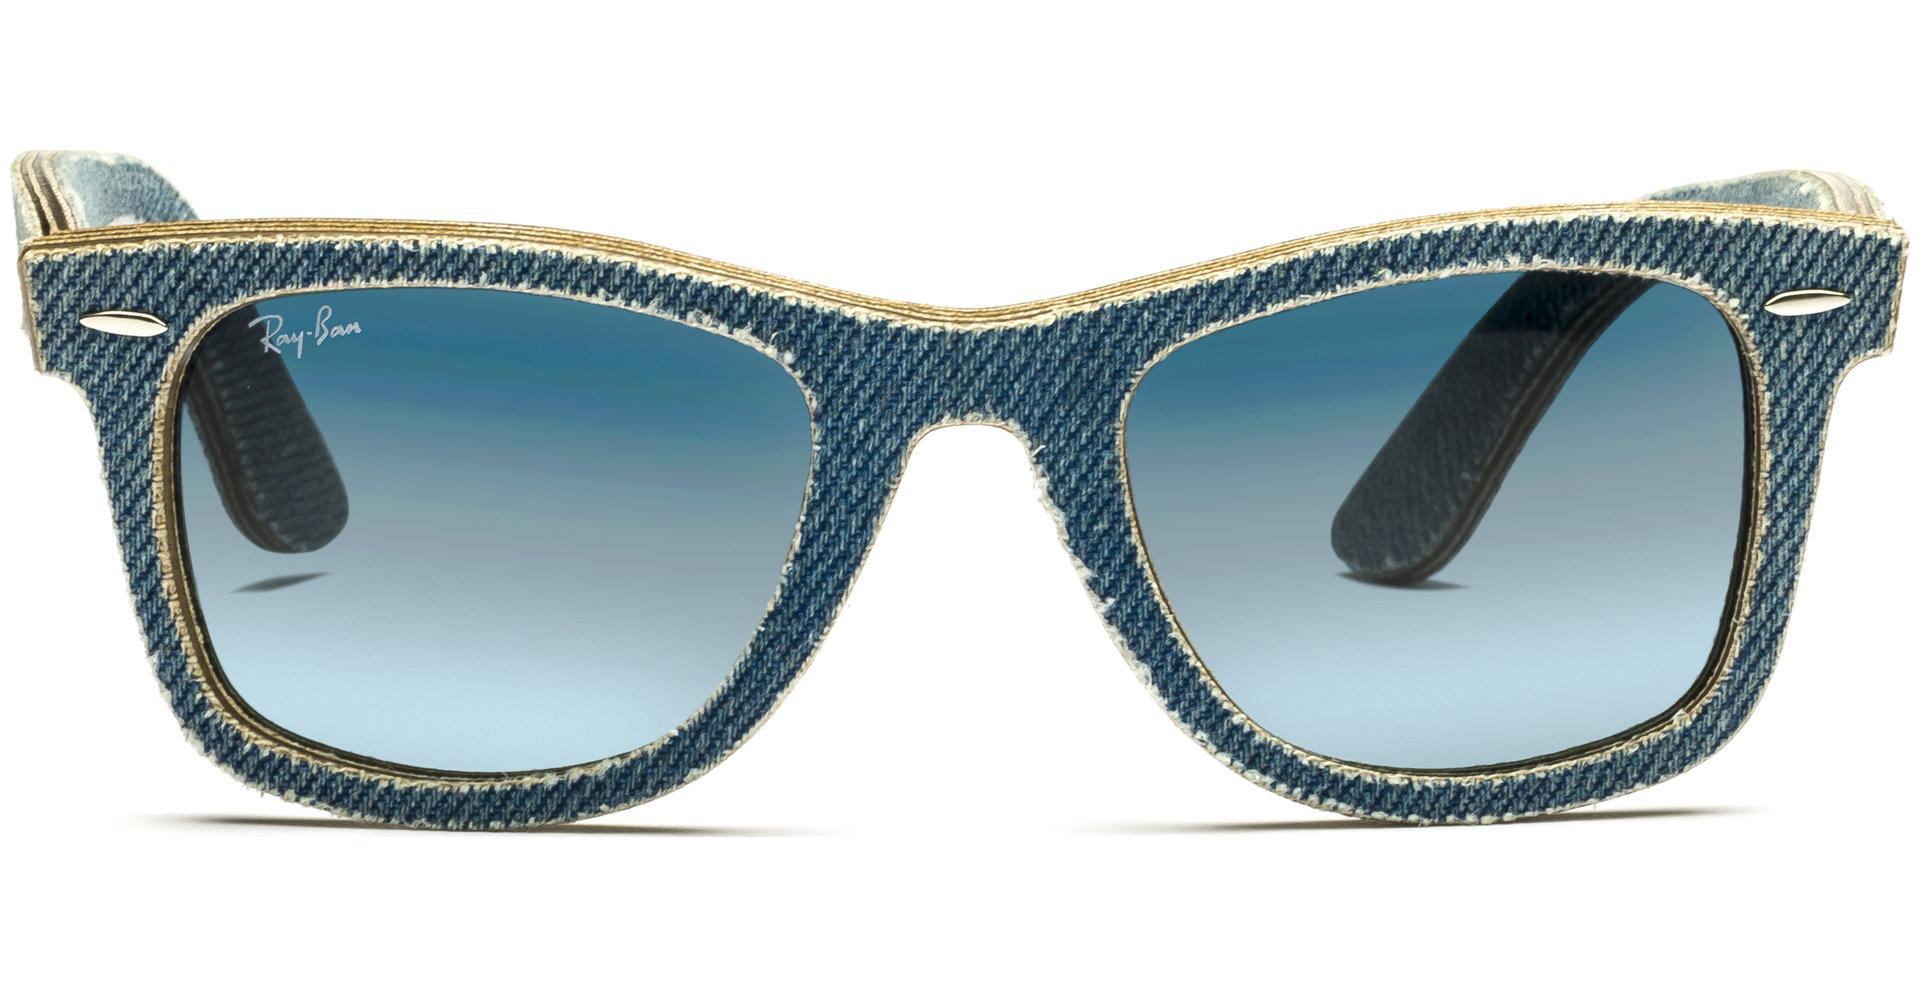 ec2342fa798 Ray-Ban - Denim Wayfarer RB2140 11644M 5022 Jeans Azure Blue Gradient Grey -